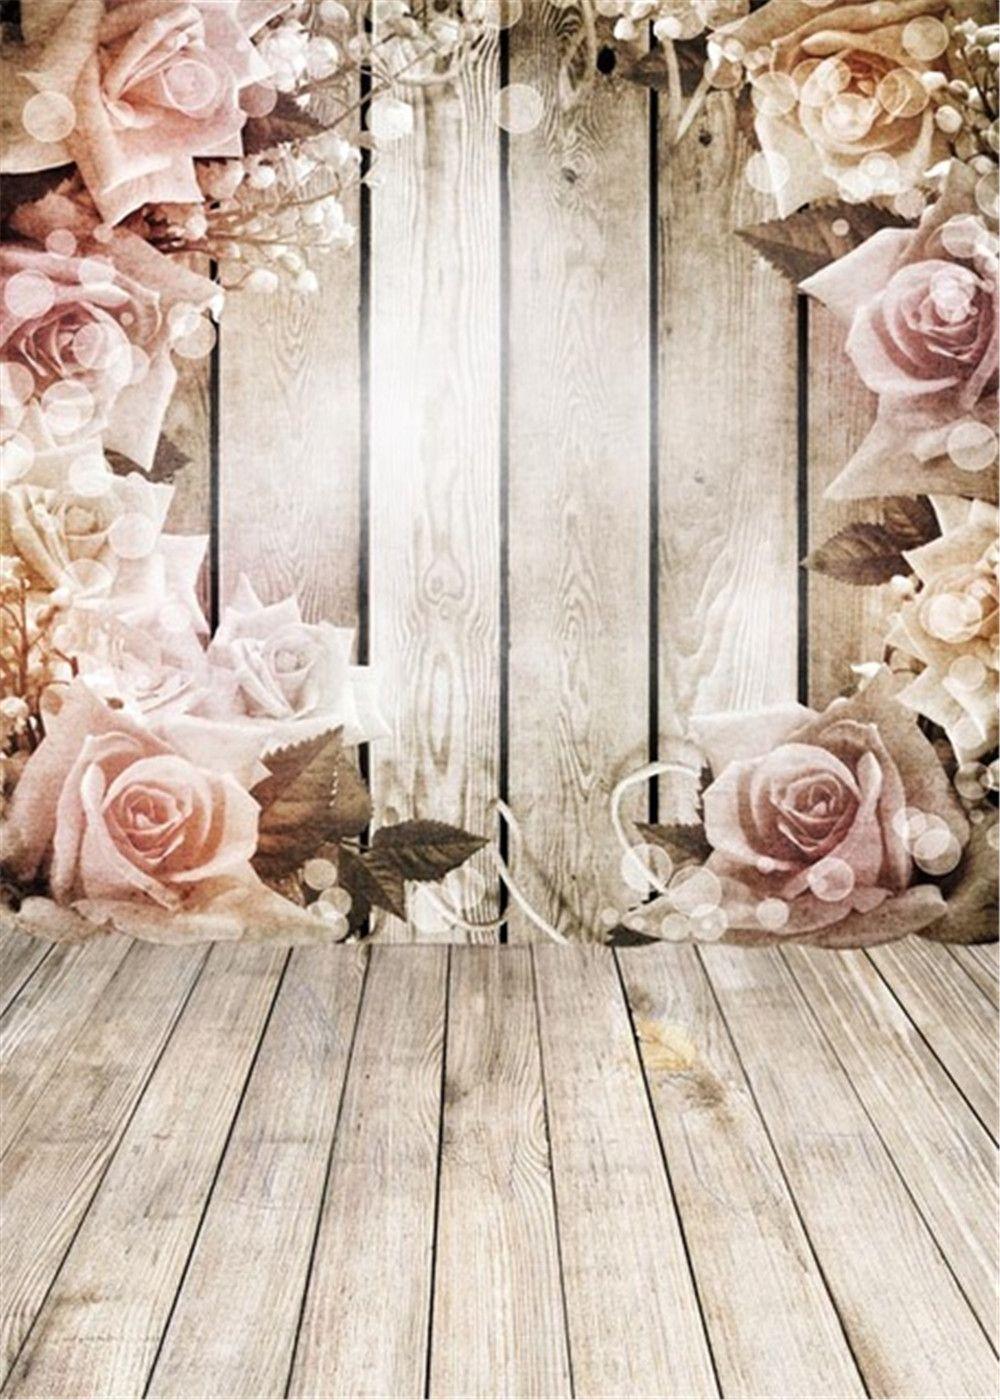 2019 Wooden Wall Floor Pink Roses Vintage Vinyl Backgrounds For